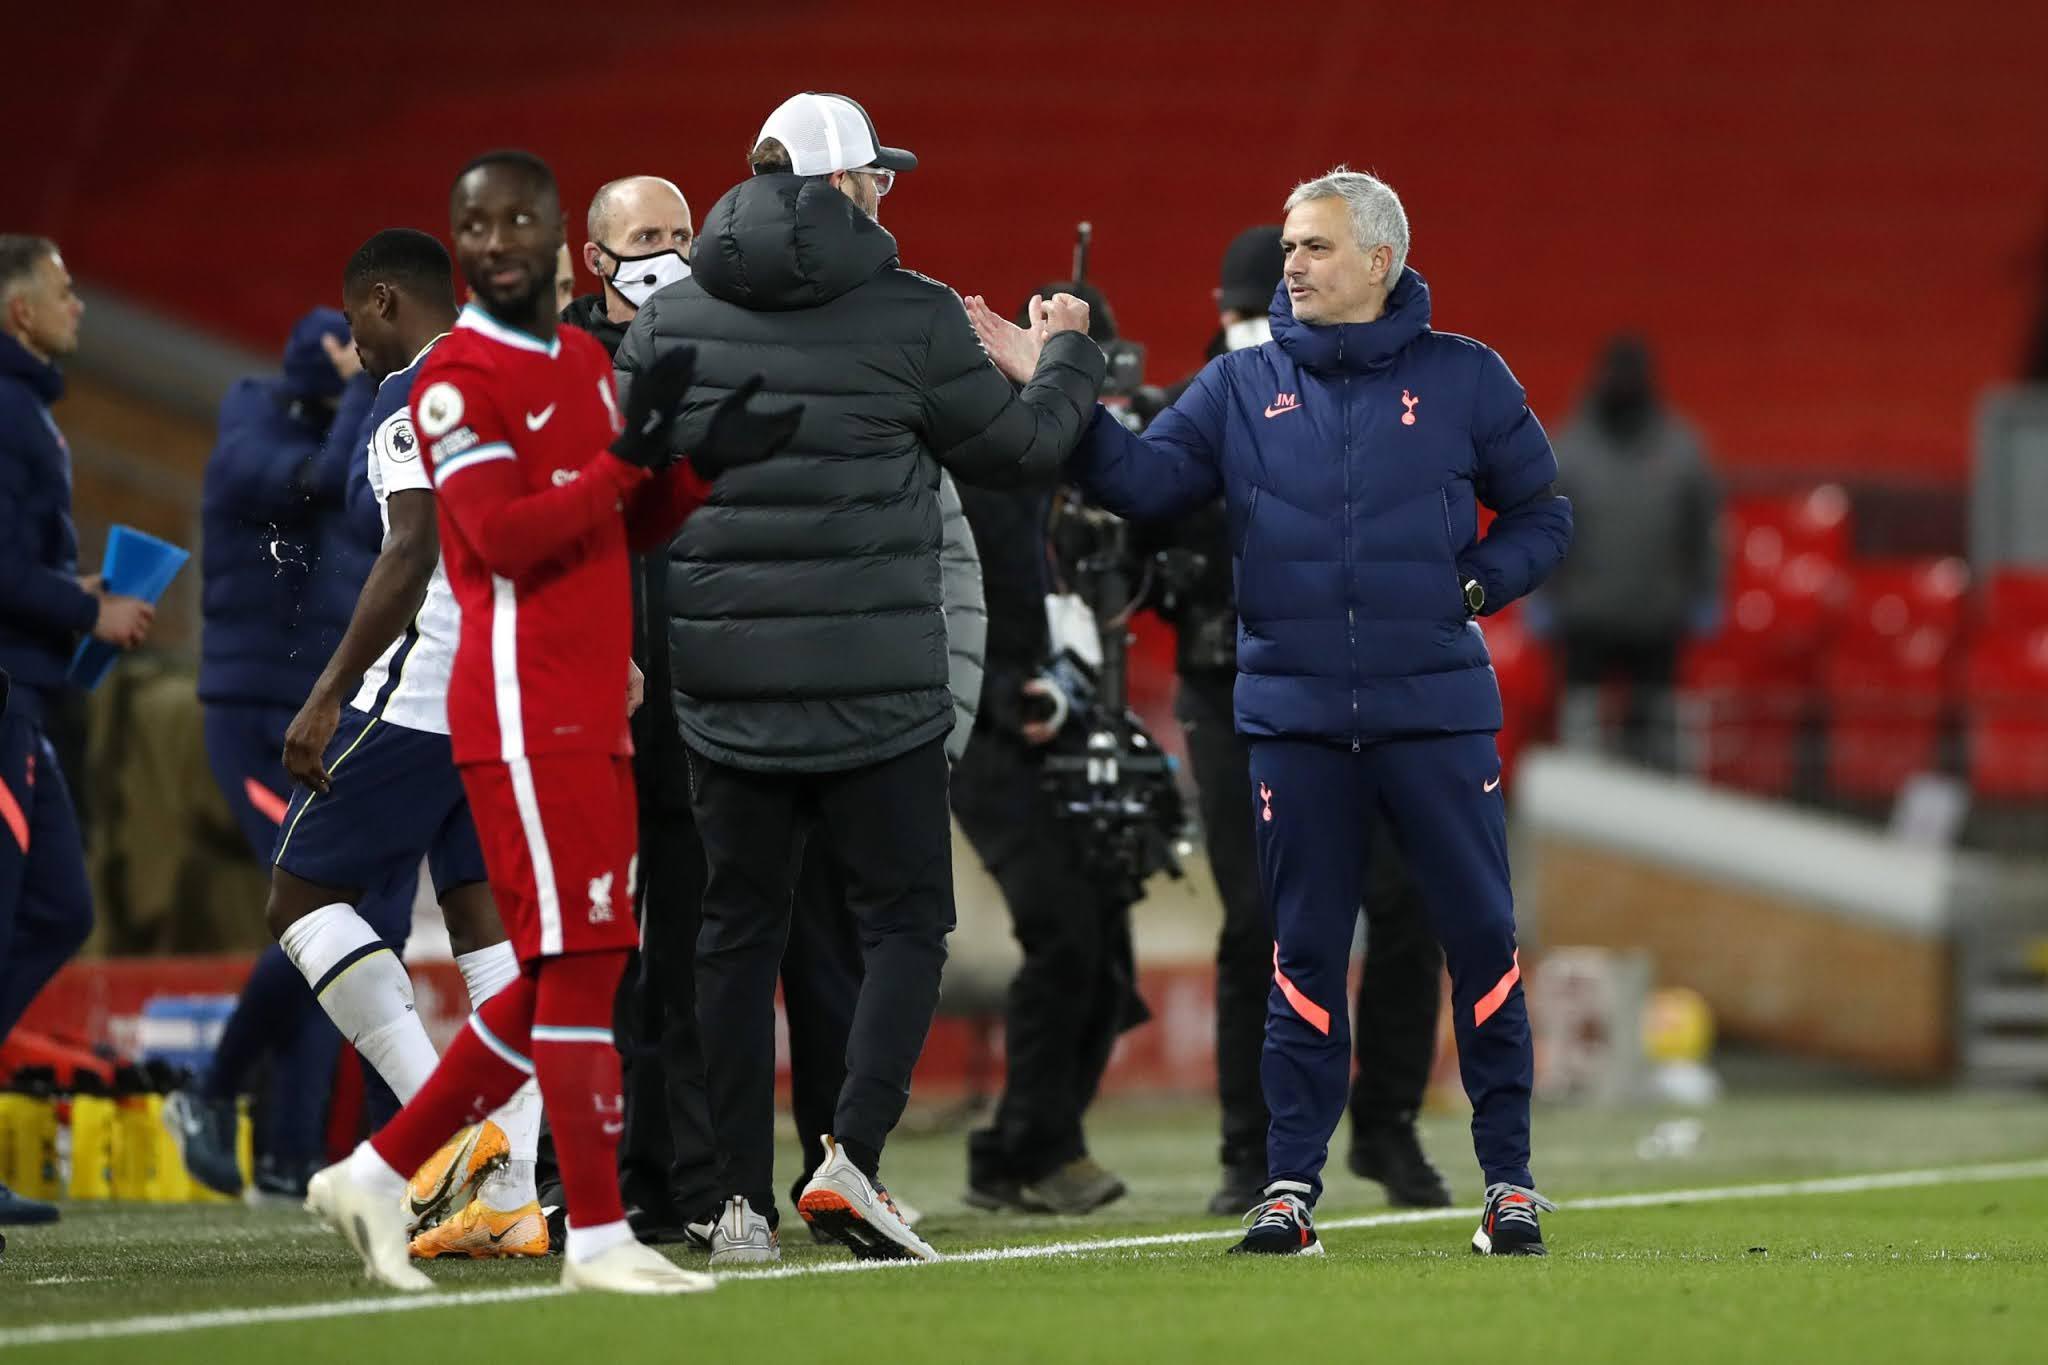 Jose Mourinho's Tottenham and Jurgen Klopp's Liverpool go toe-to-toe in the headline act on Thursday night